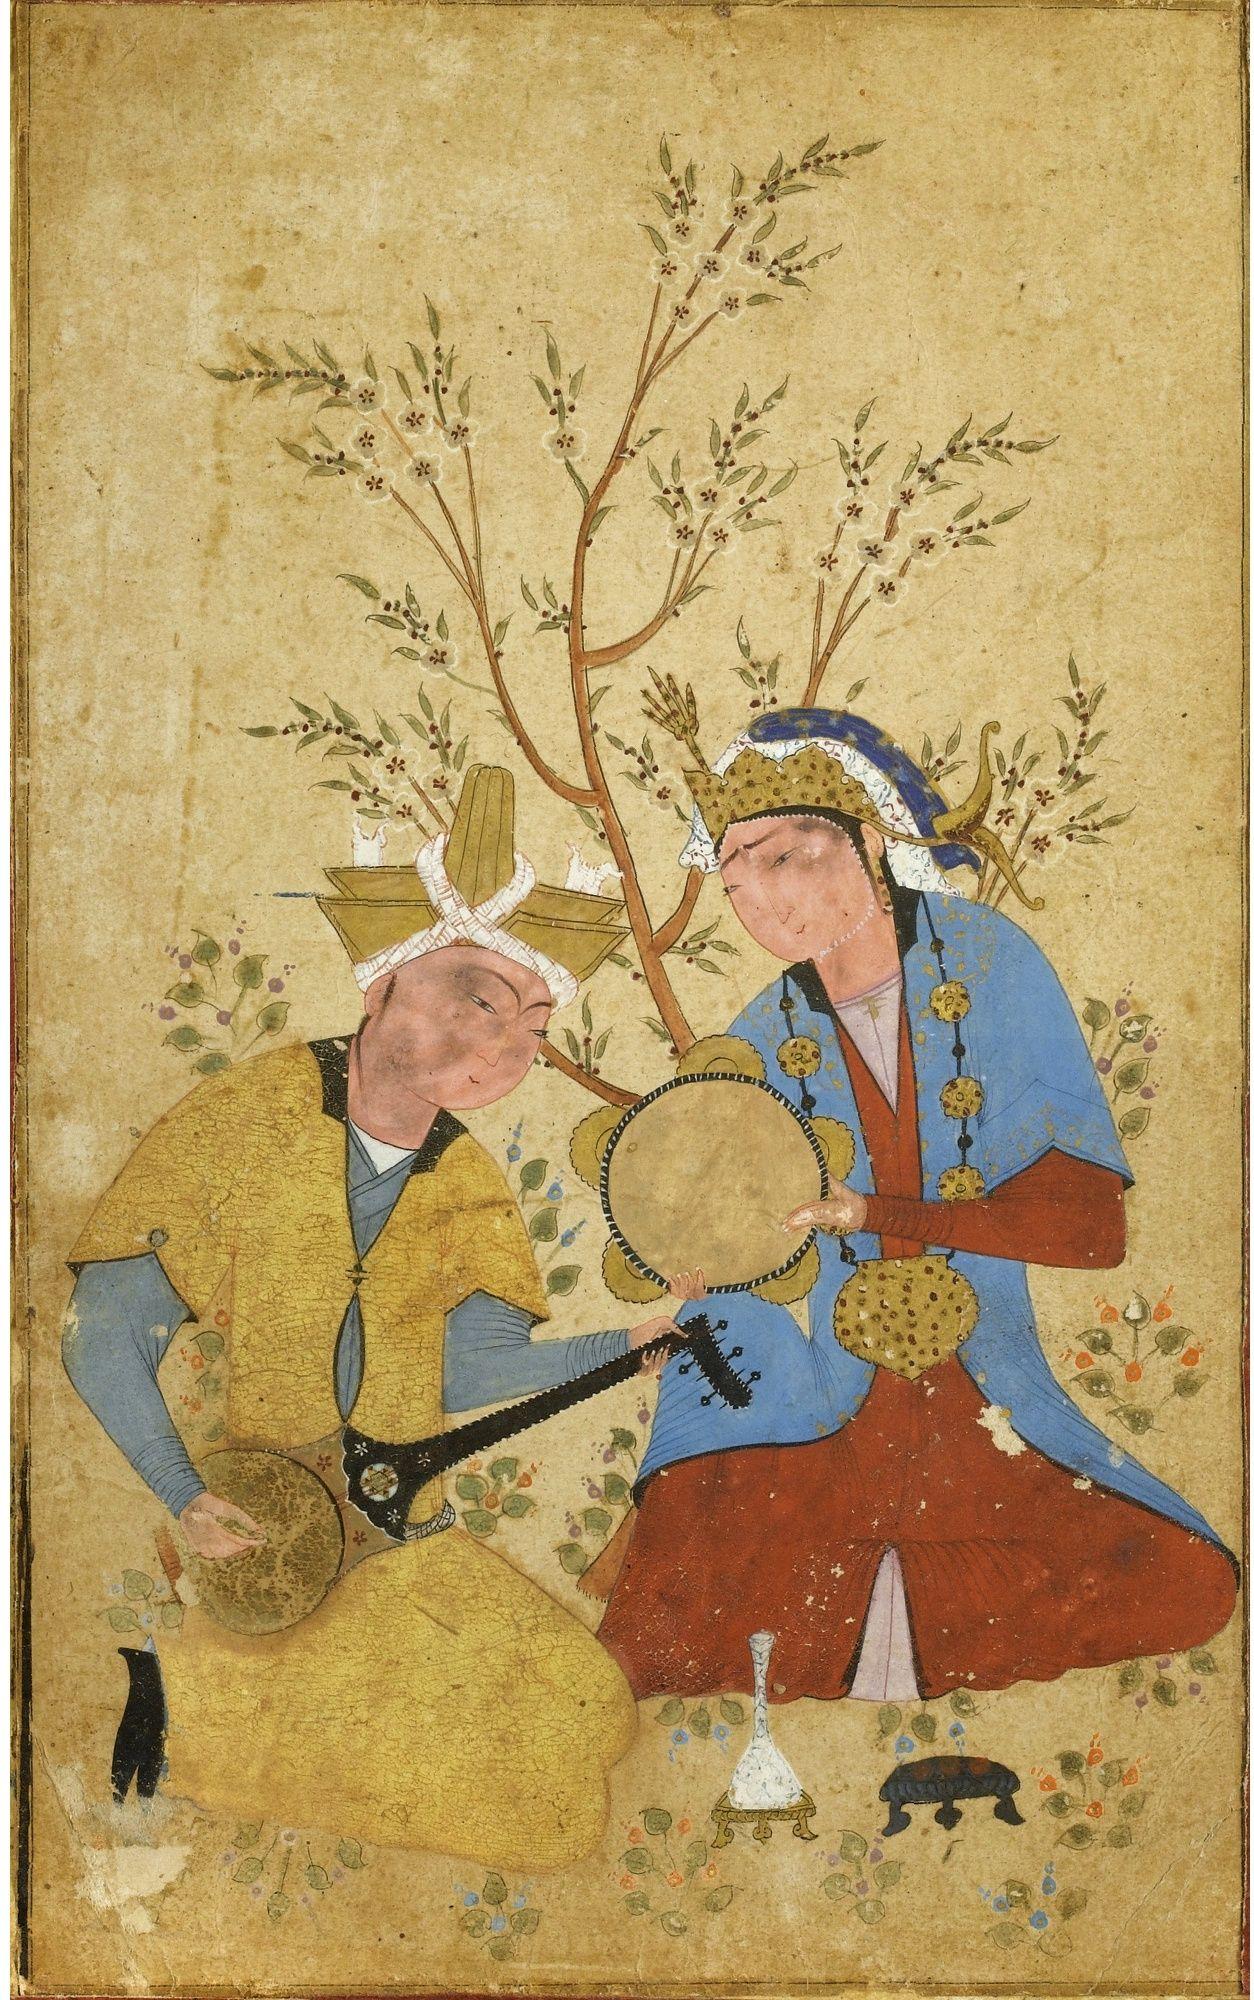 Dva Muzykanta Pod Derevom Ok 1550 Chastnoe Sobranie Two Musicians Seated Under A Flowering Tree C 1550 Private Collection Usa Cizim Tezhip Sanat